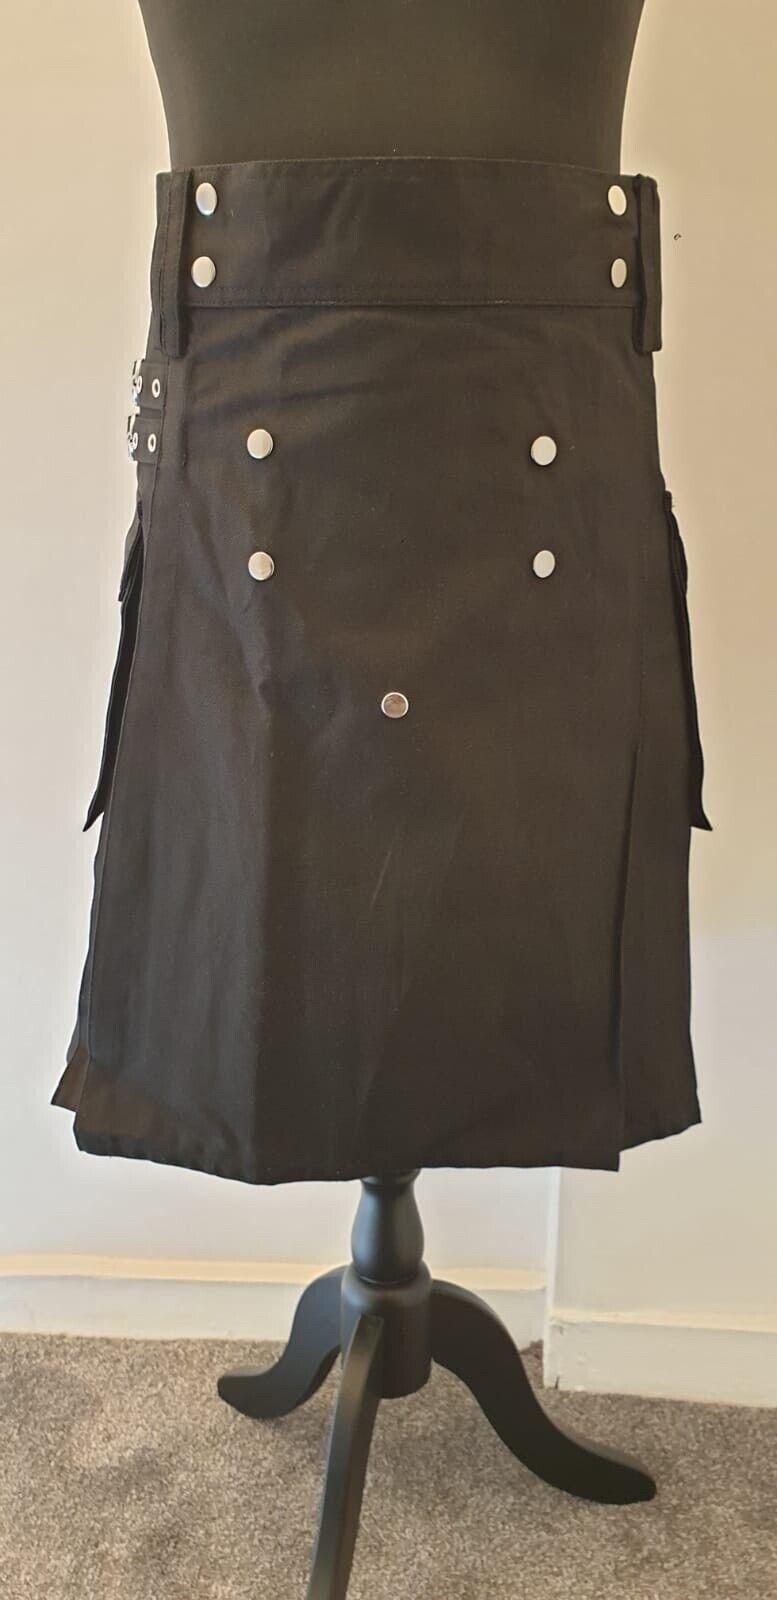 Men's Brand New Black Cotton Utility Kilt, Good Quality 100% Cotton Size 36